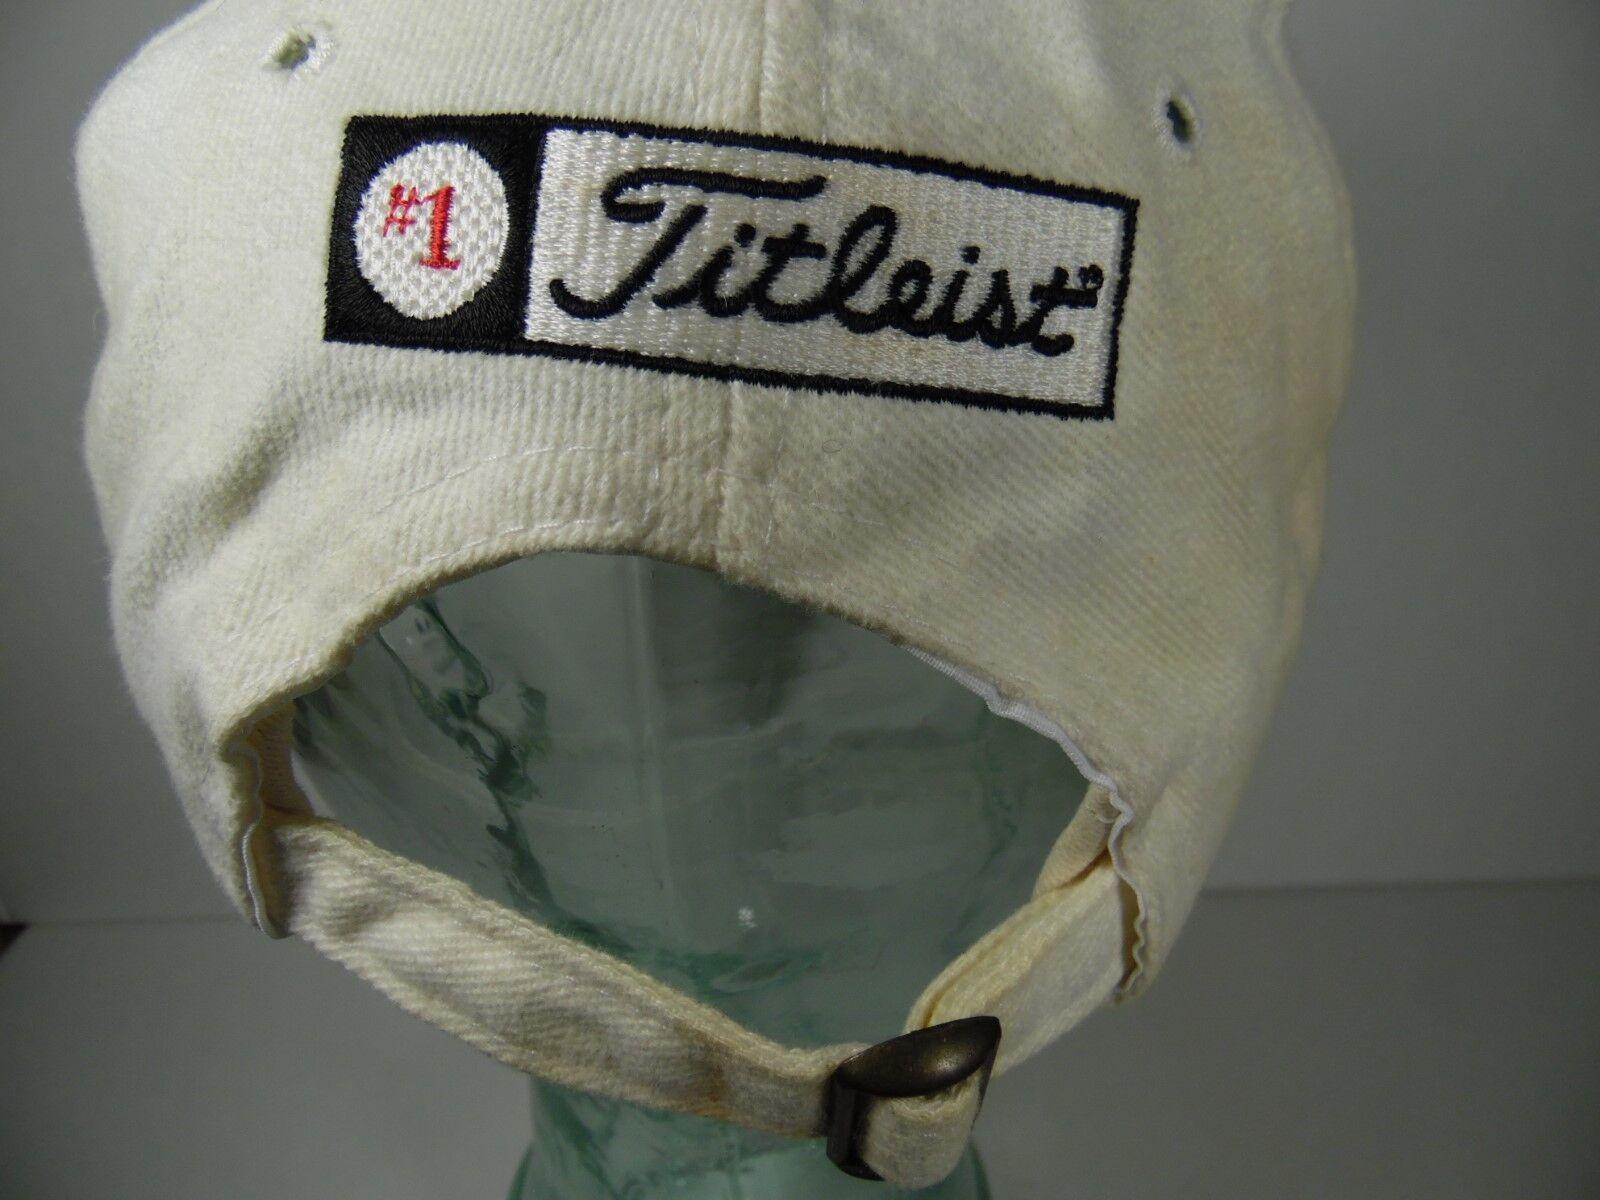 TITLEIST GOLF NEW ERA ADJUSTABLE STRAP CREAM HAT CAP LIGHT BROWN CREAM STRAP OFF WHITE COLOR 711bcb